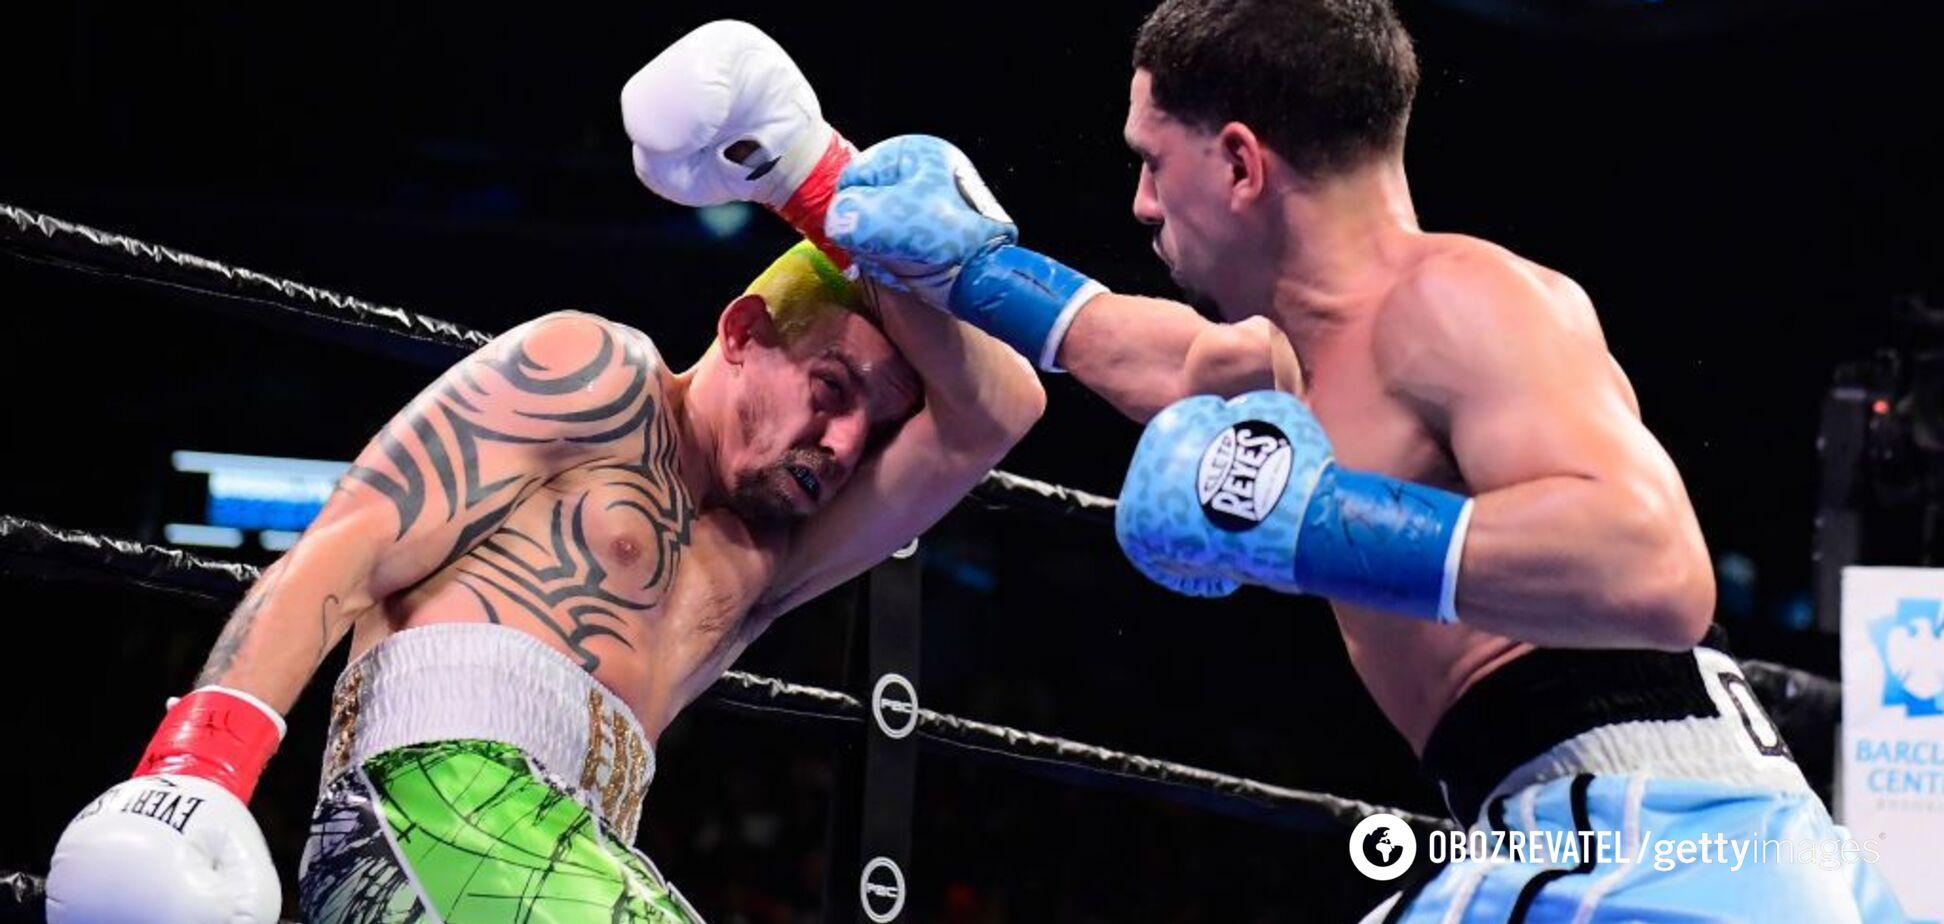 'О, чорт!' Знаменитий український боксер показав обличчя після бою (18+)